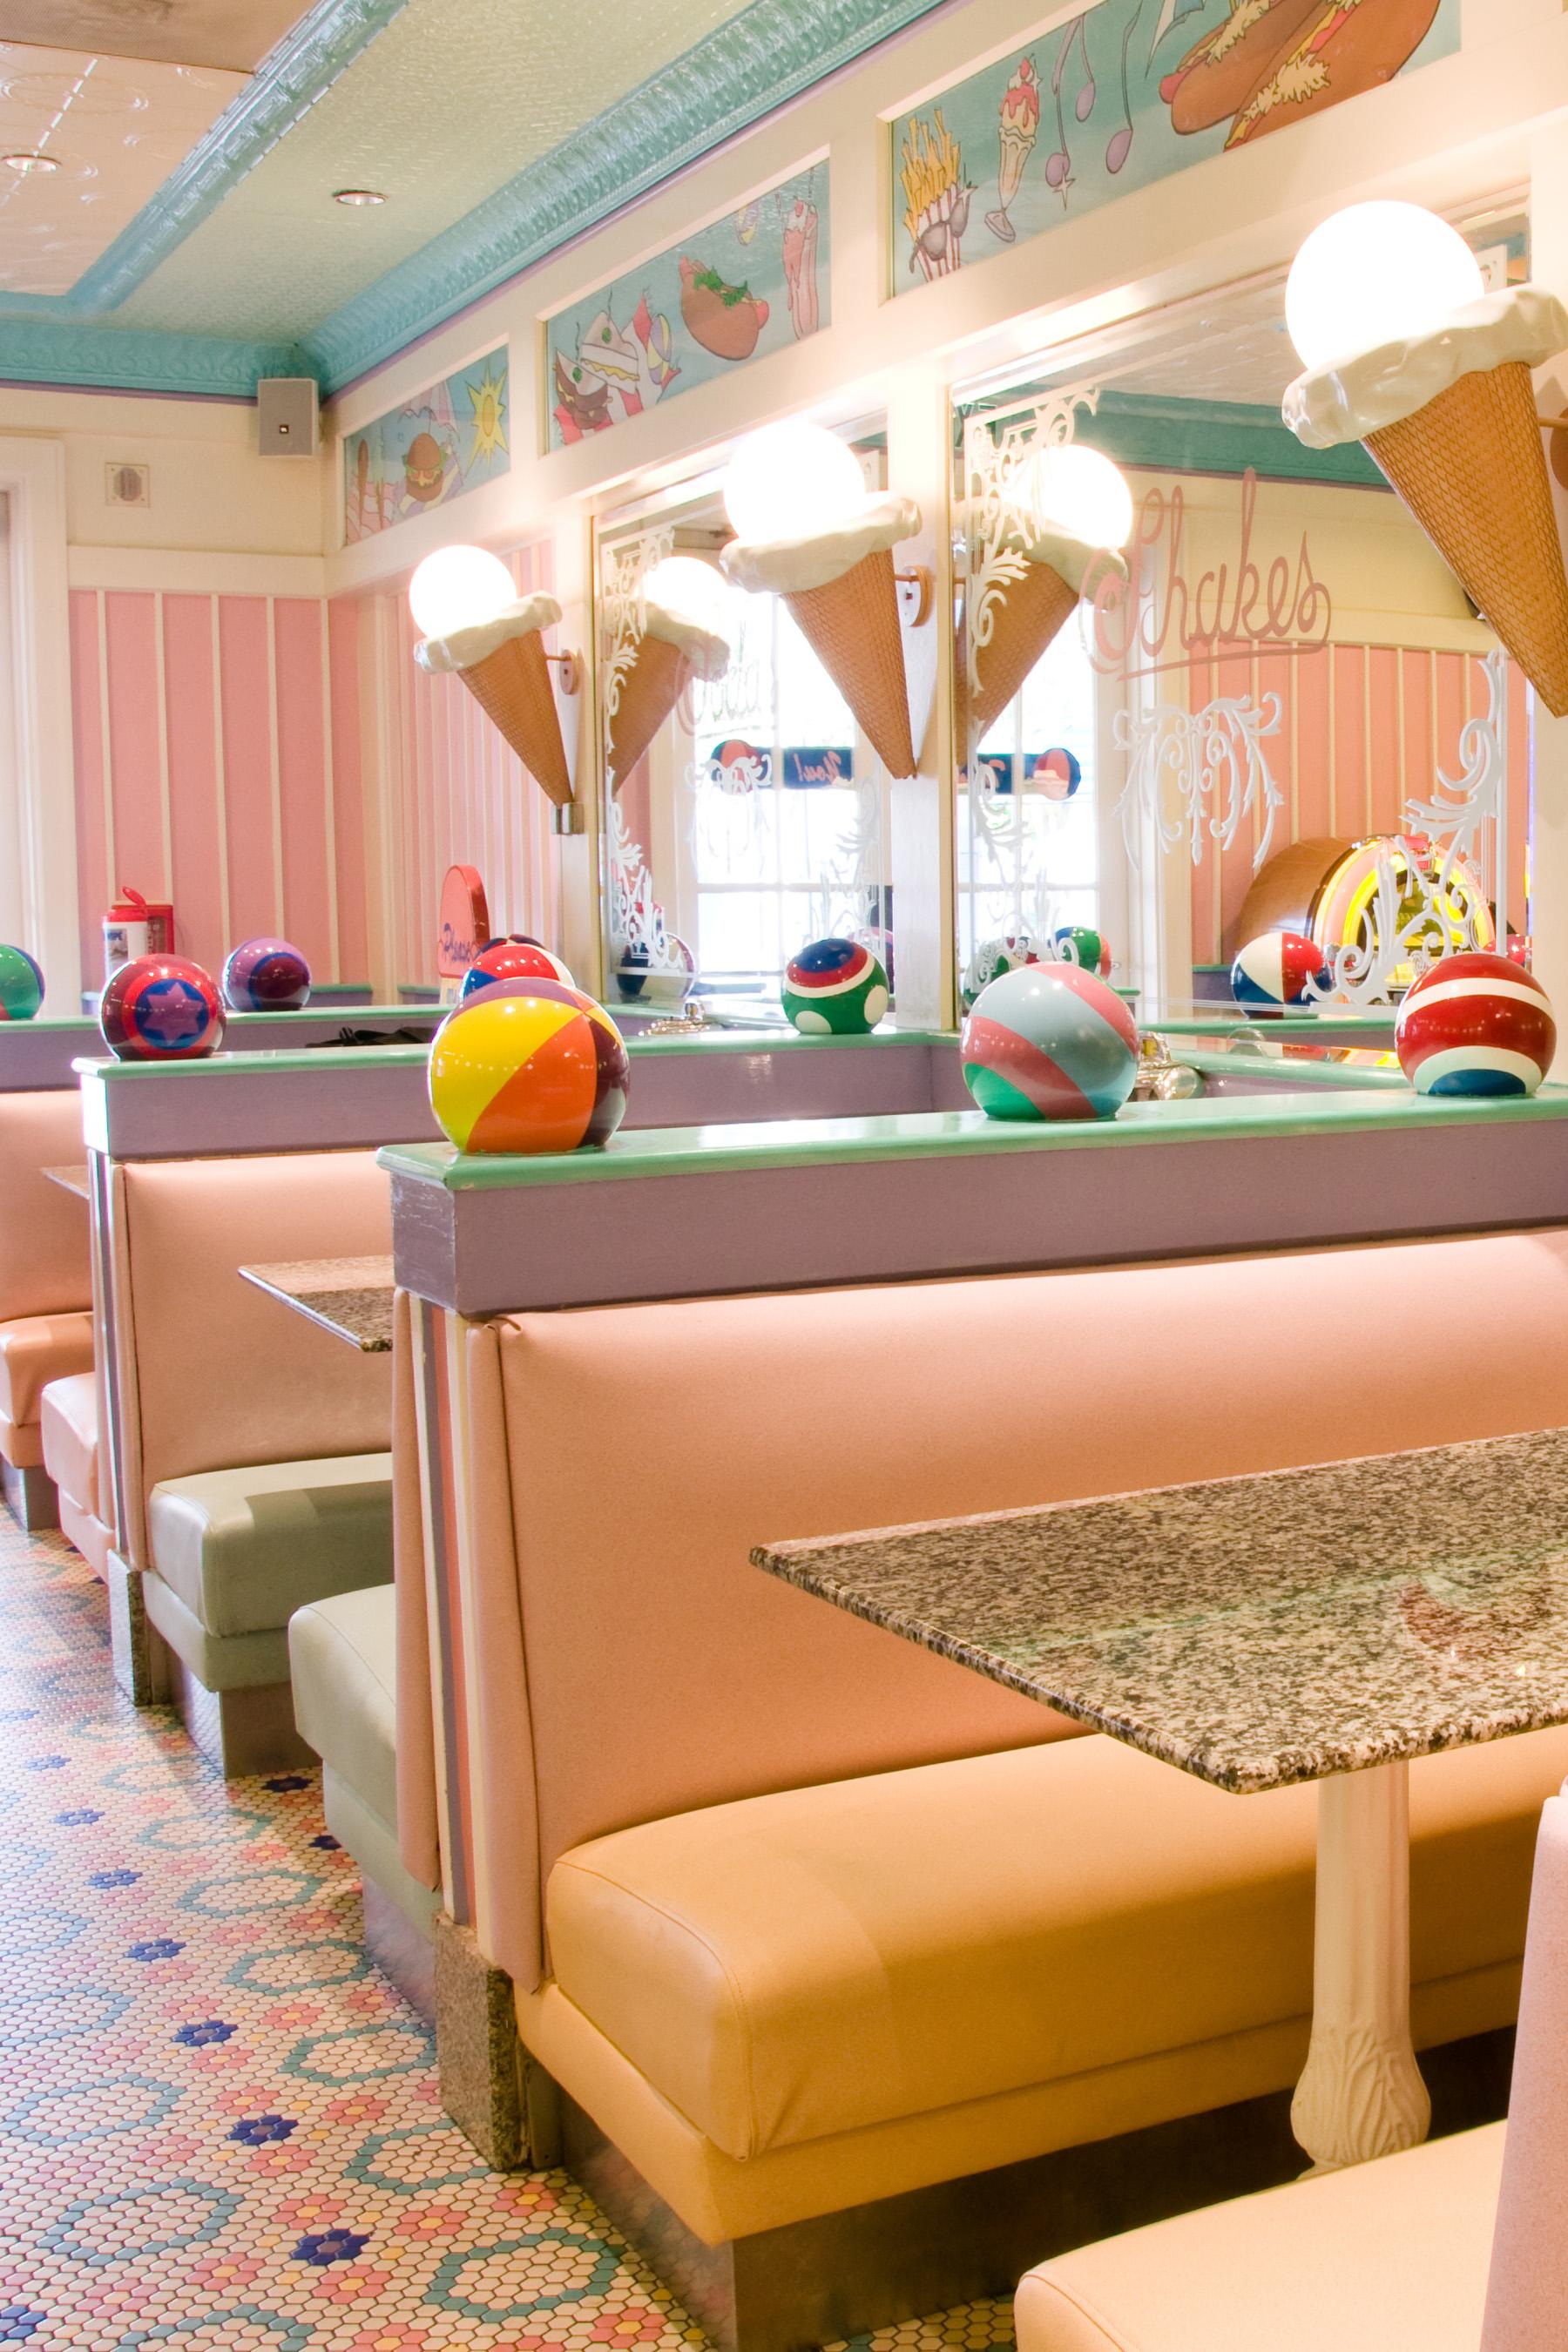 Best Disney Restaurants Beaches and Cream Soda Shop